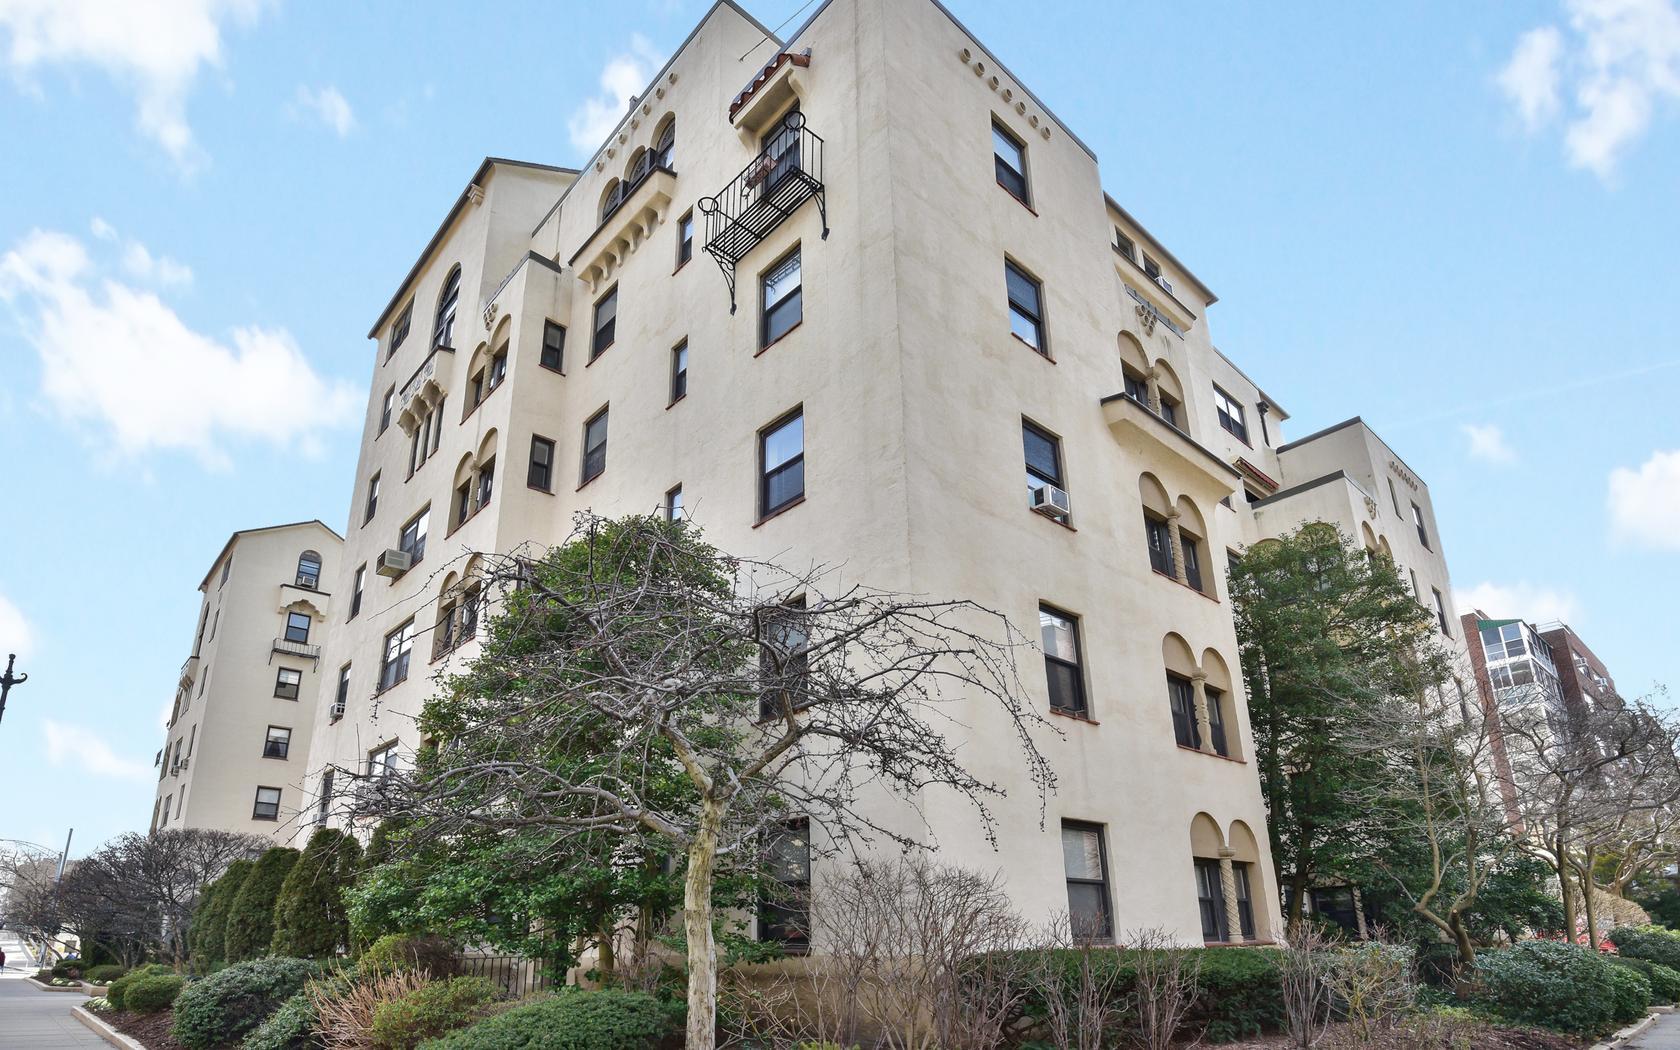 17 North Chatsworth Avenue 5de Larchmont Ny 10538 Real